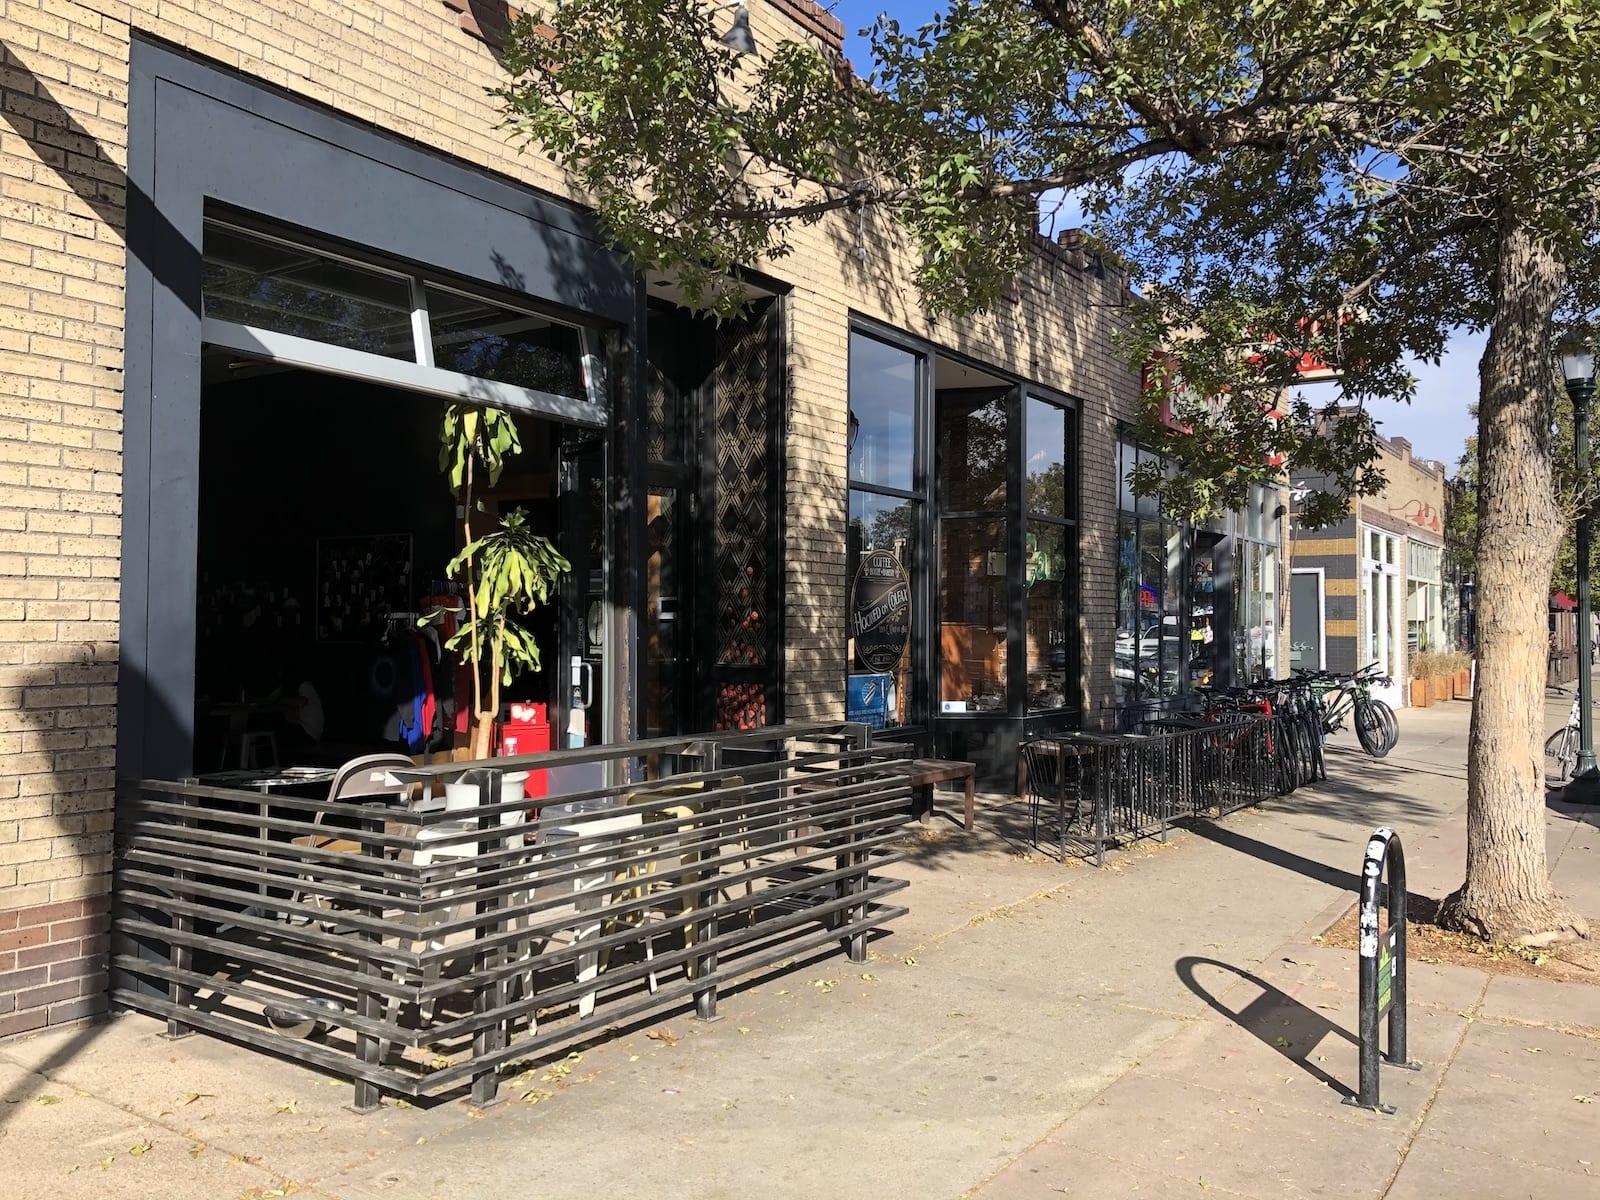 East Colfax Avenue Hooked on Colfax Coffeeshop